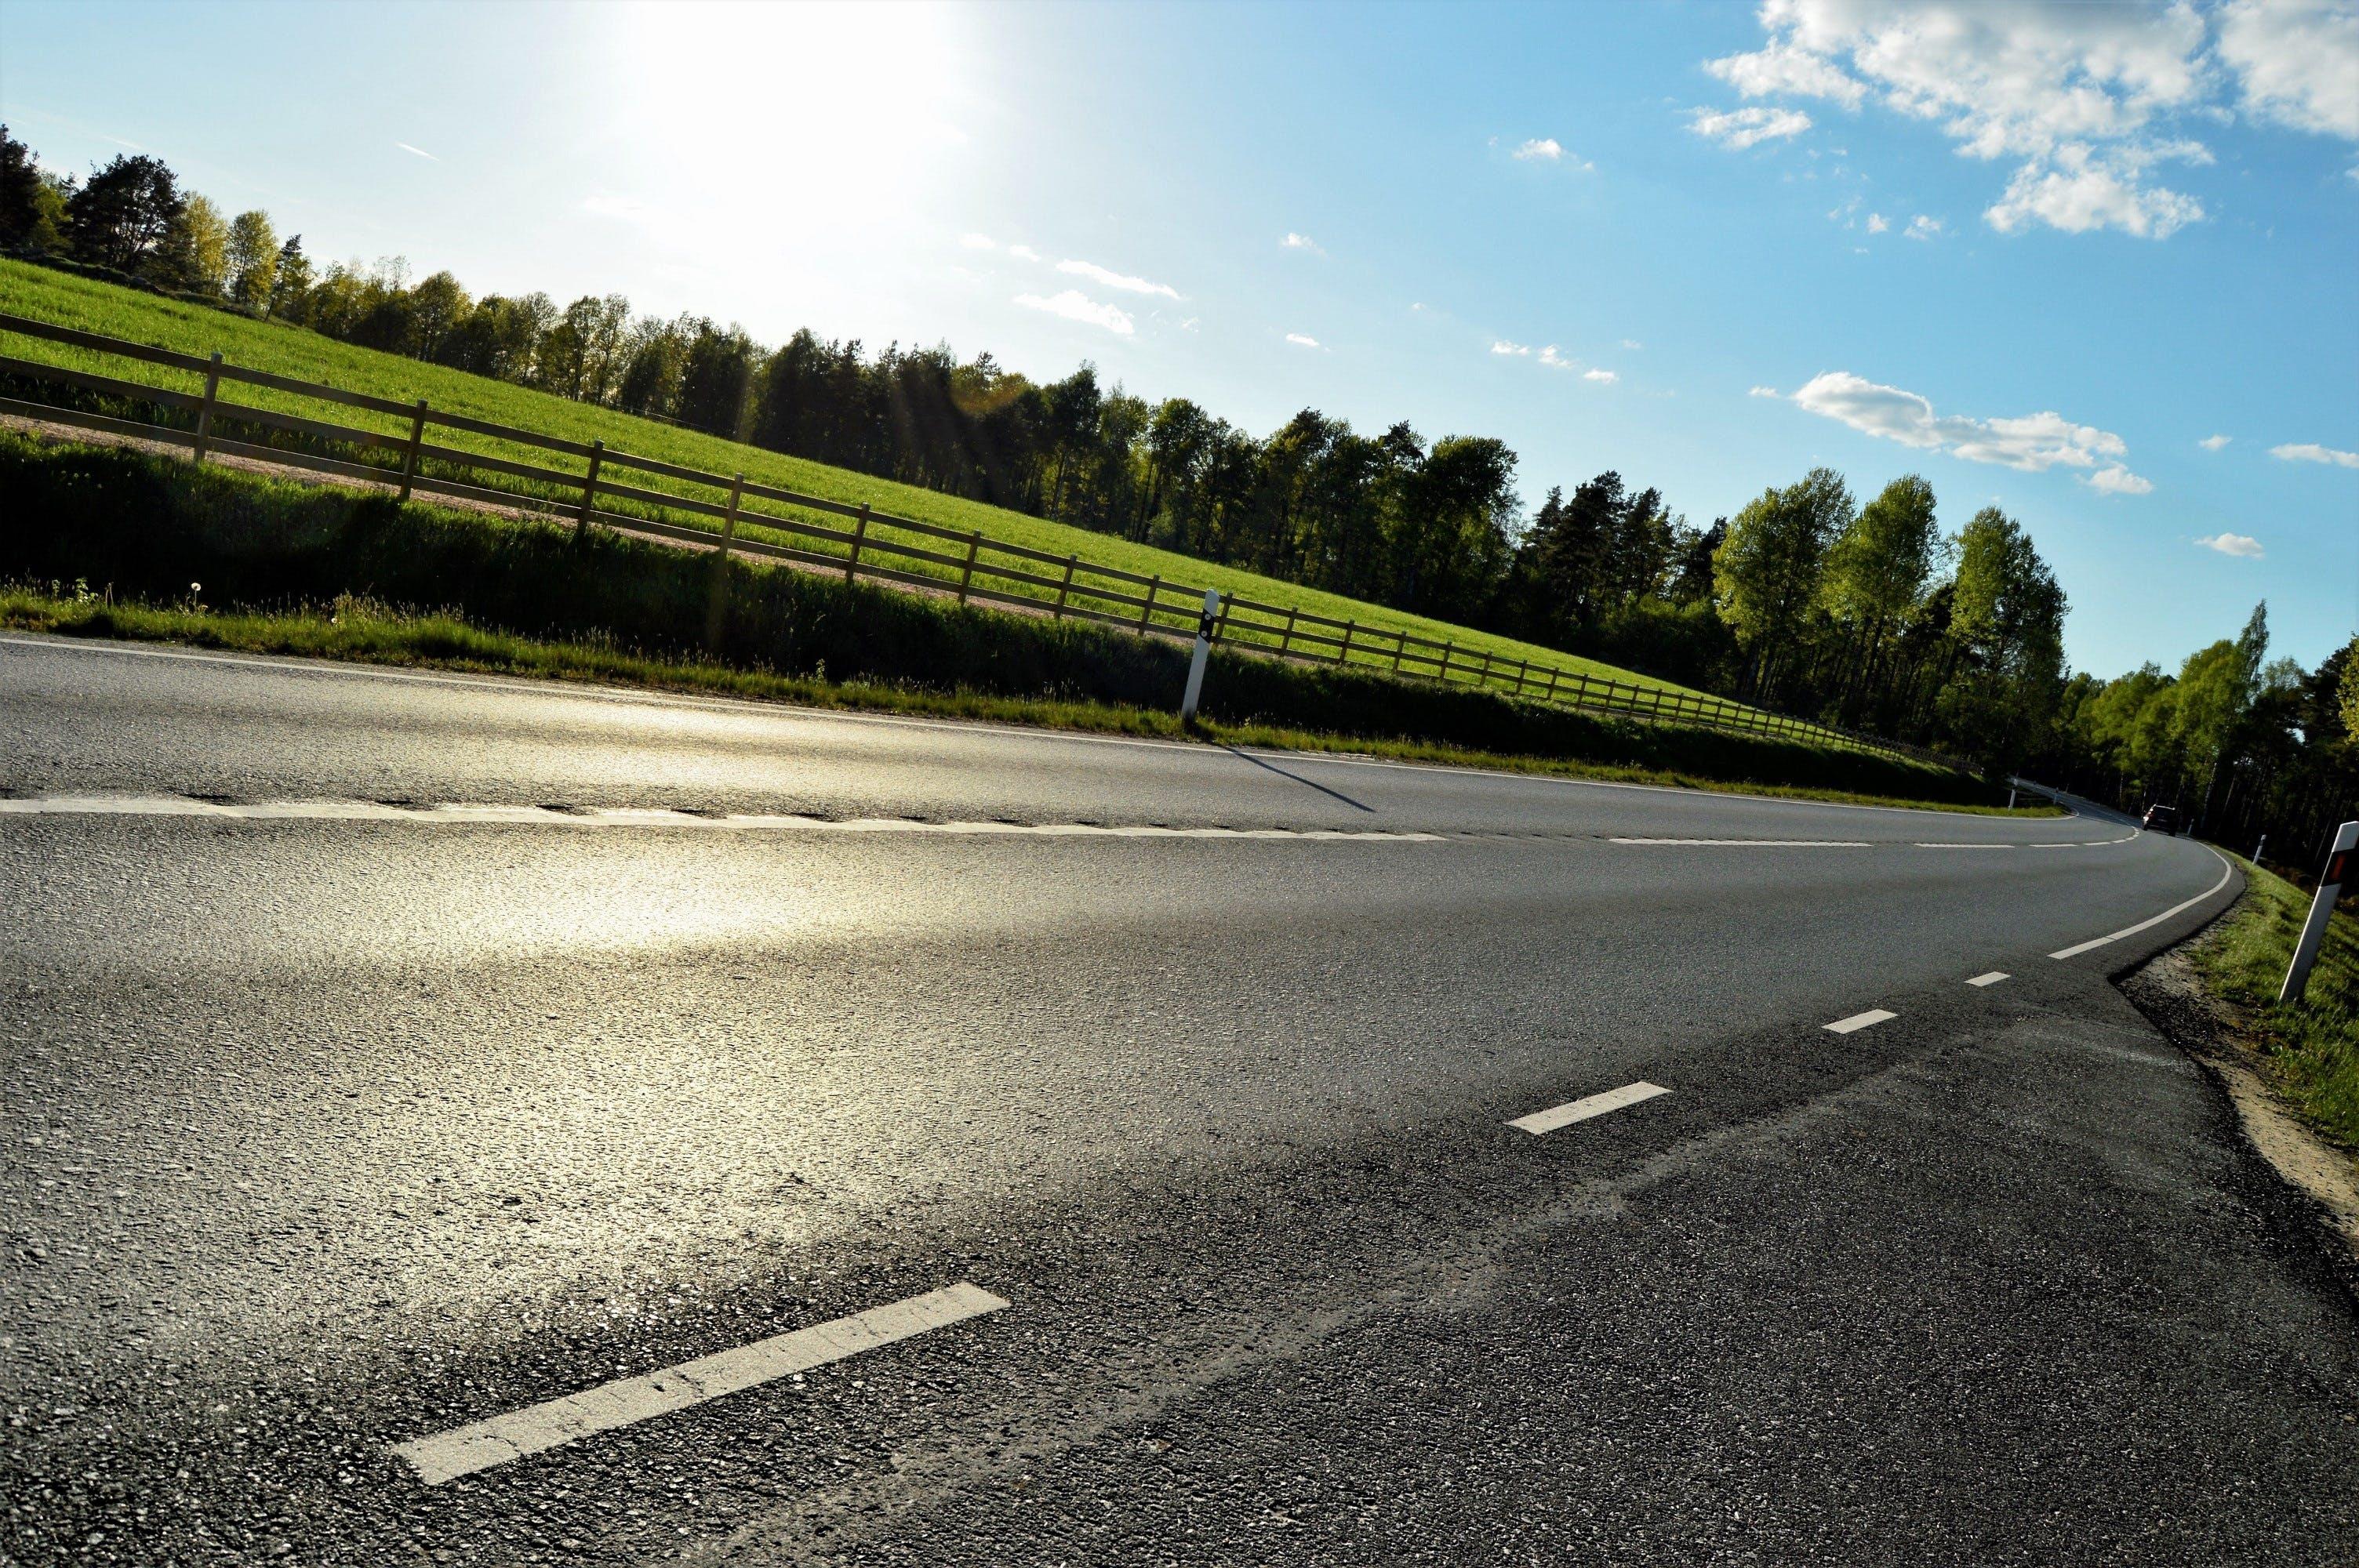 Kostenloses Stock Foto zu asphalt, bäume, beratung, fahrbahn